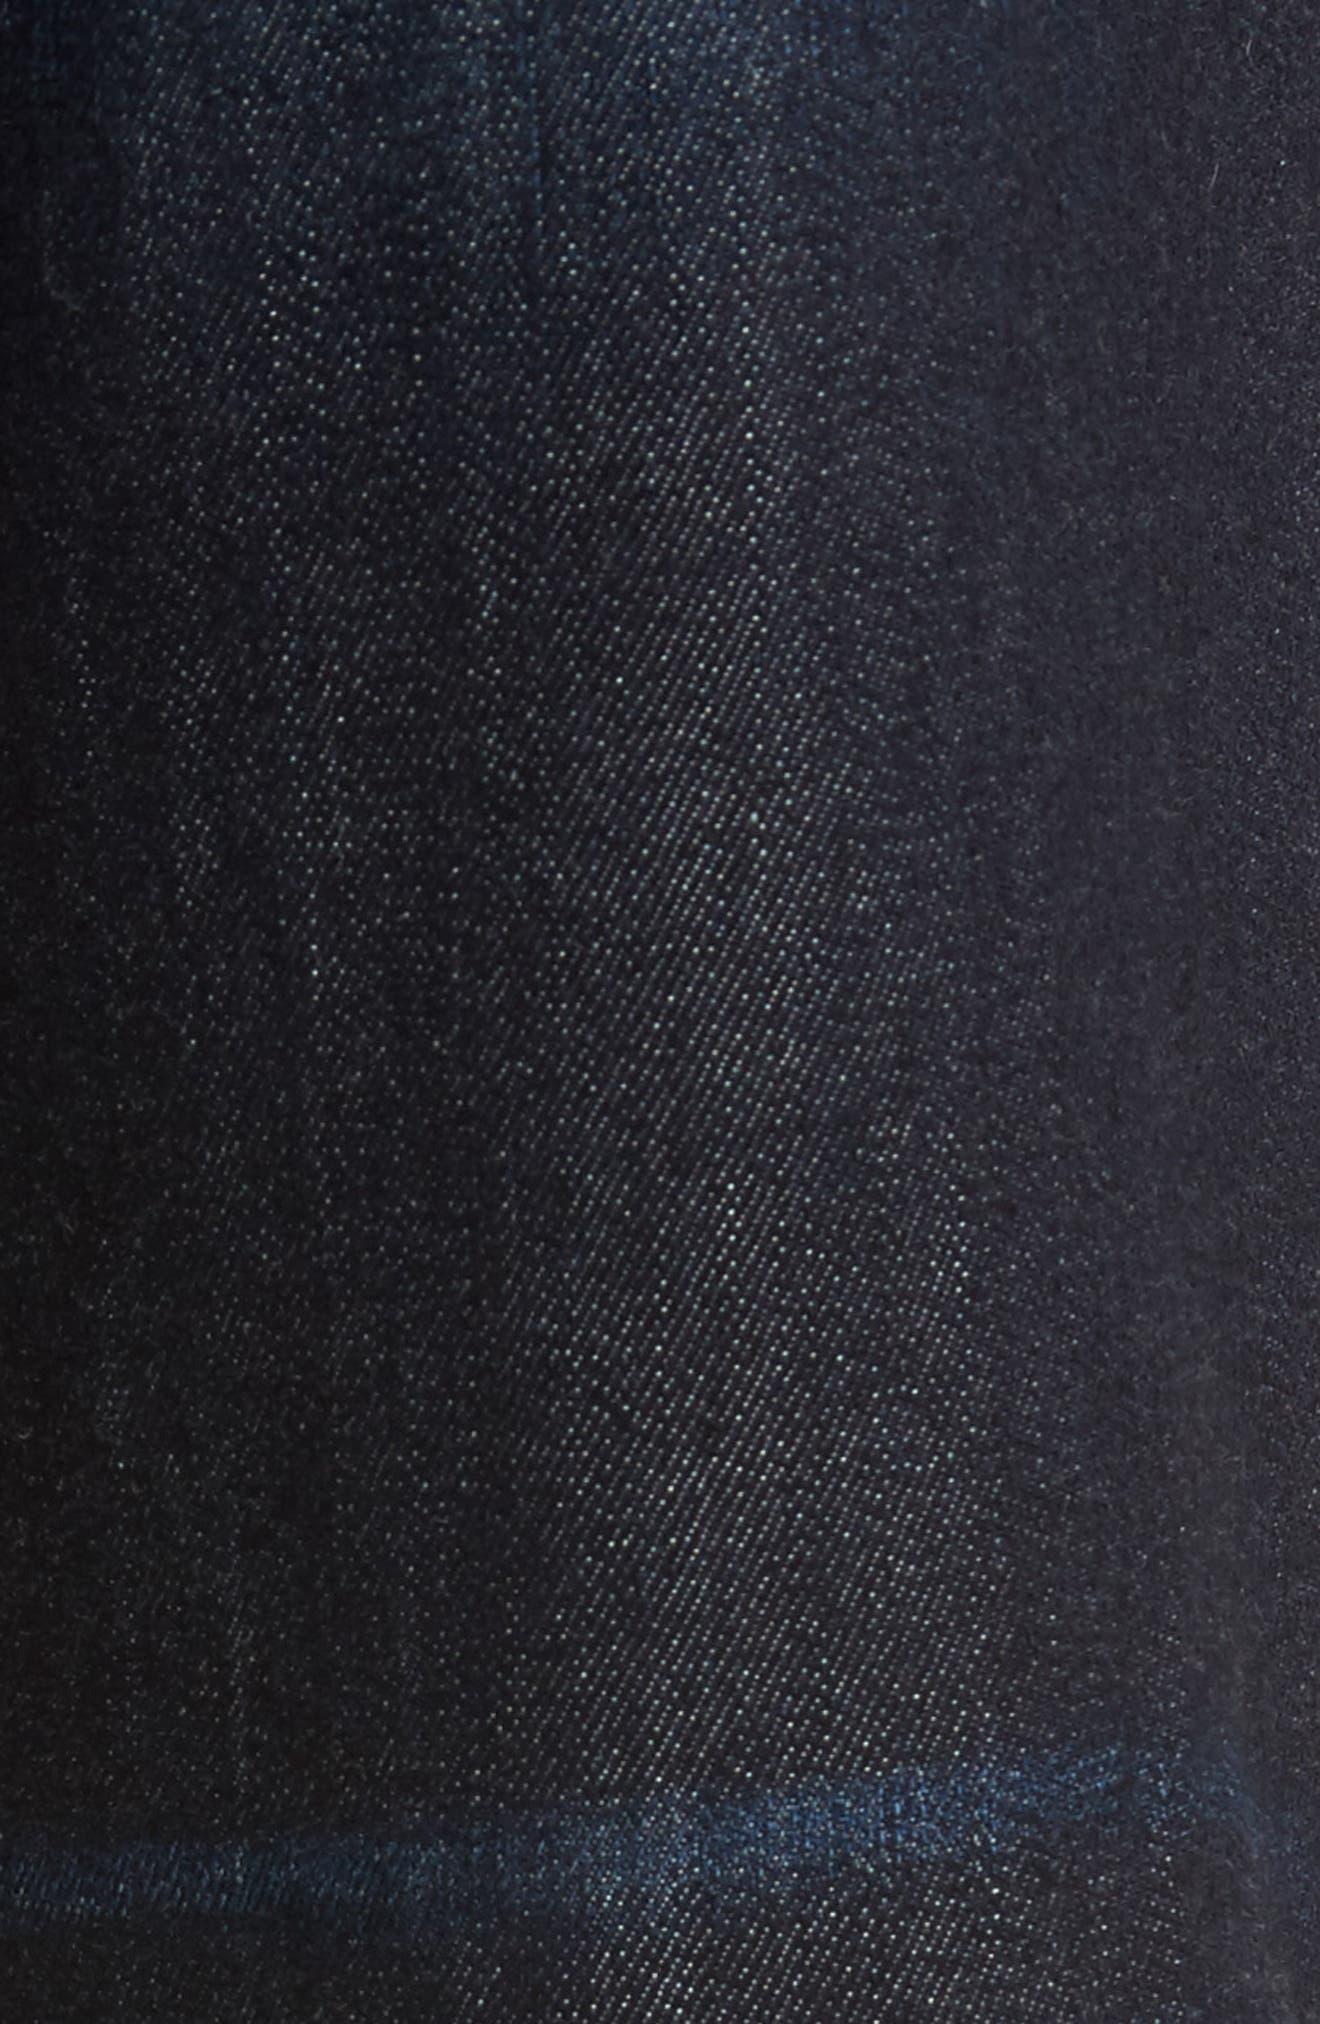 Brixton Slim Straight Fit Jeans,                             Alternate thumbnail 5, color,                             405